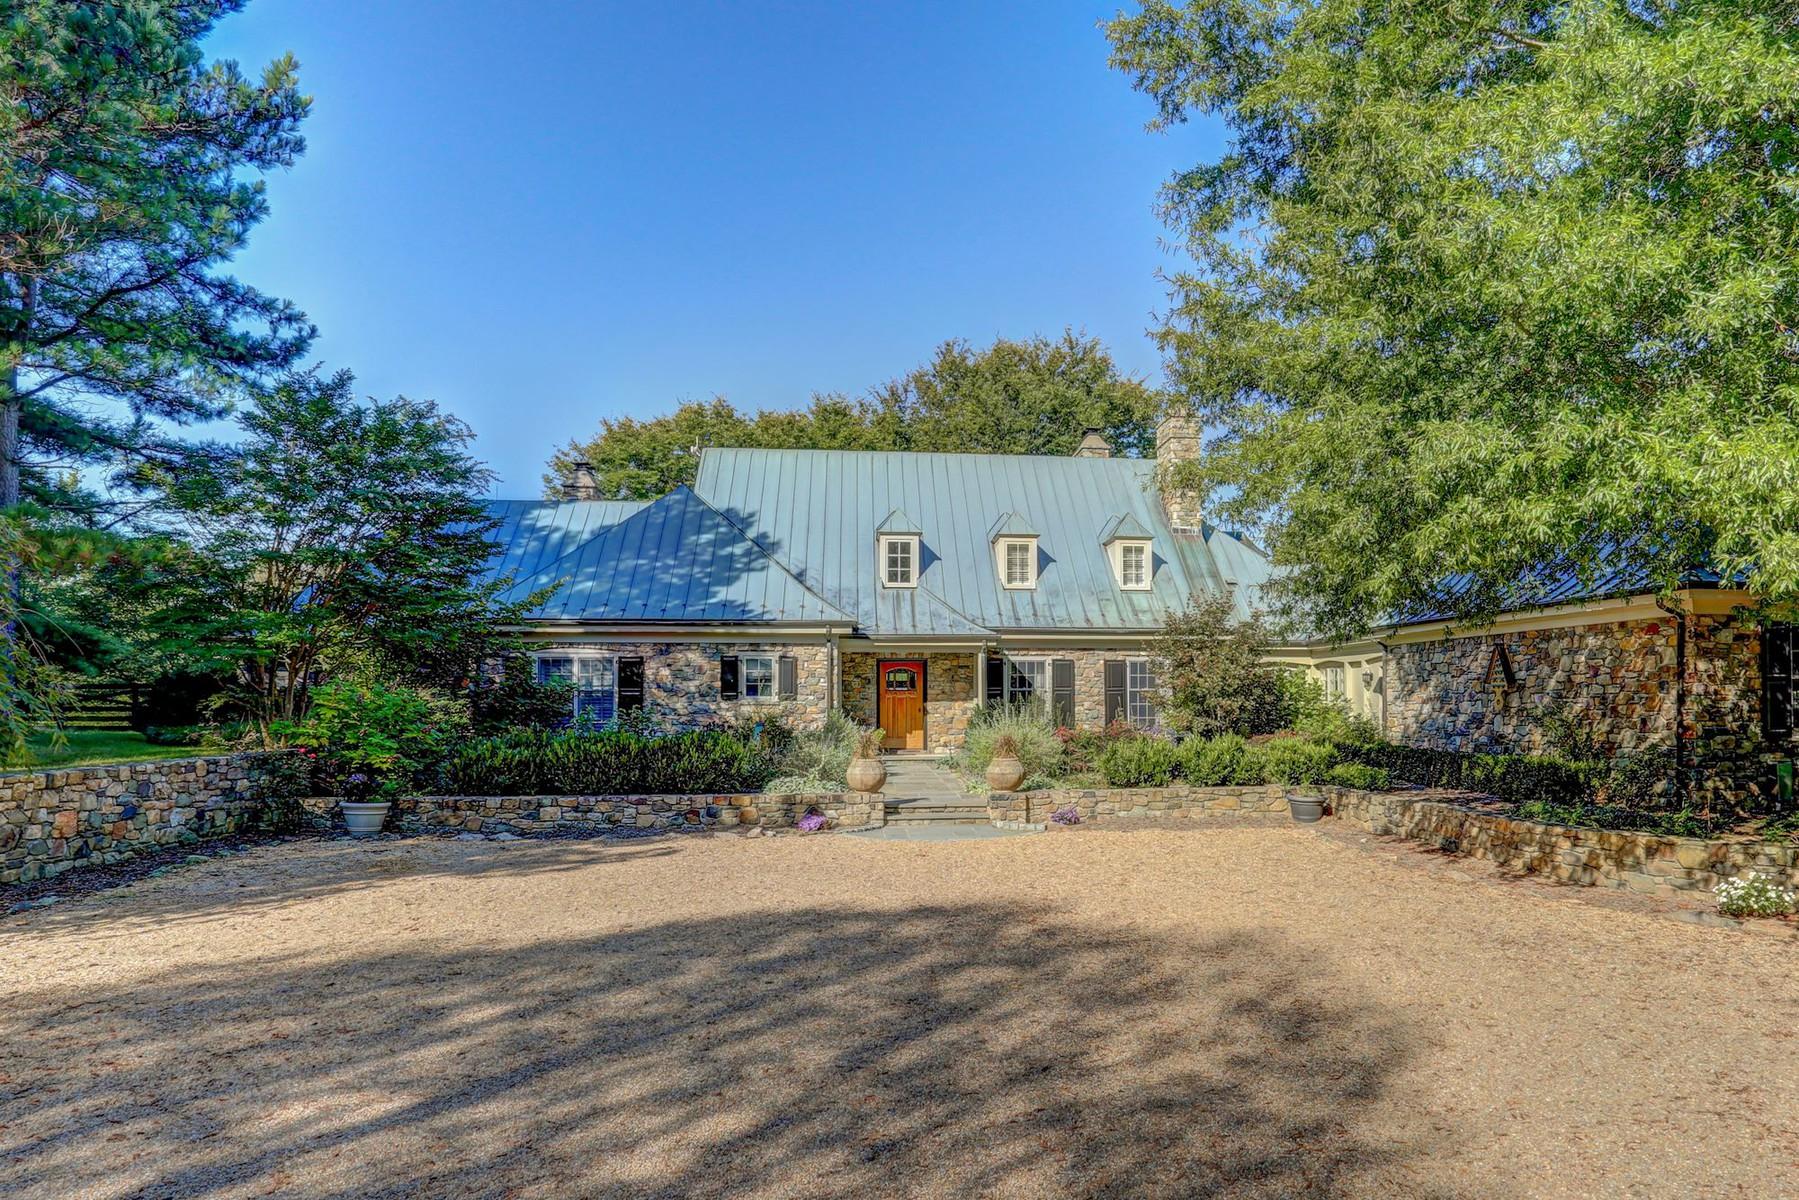 獨棟家庭住宅 為 出售 在 2380 Atoka Road, Marshall 2380 Atoka Rd Marshall, 弗吉尼亞州 20115 美國